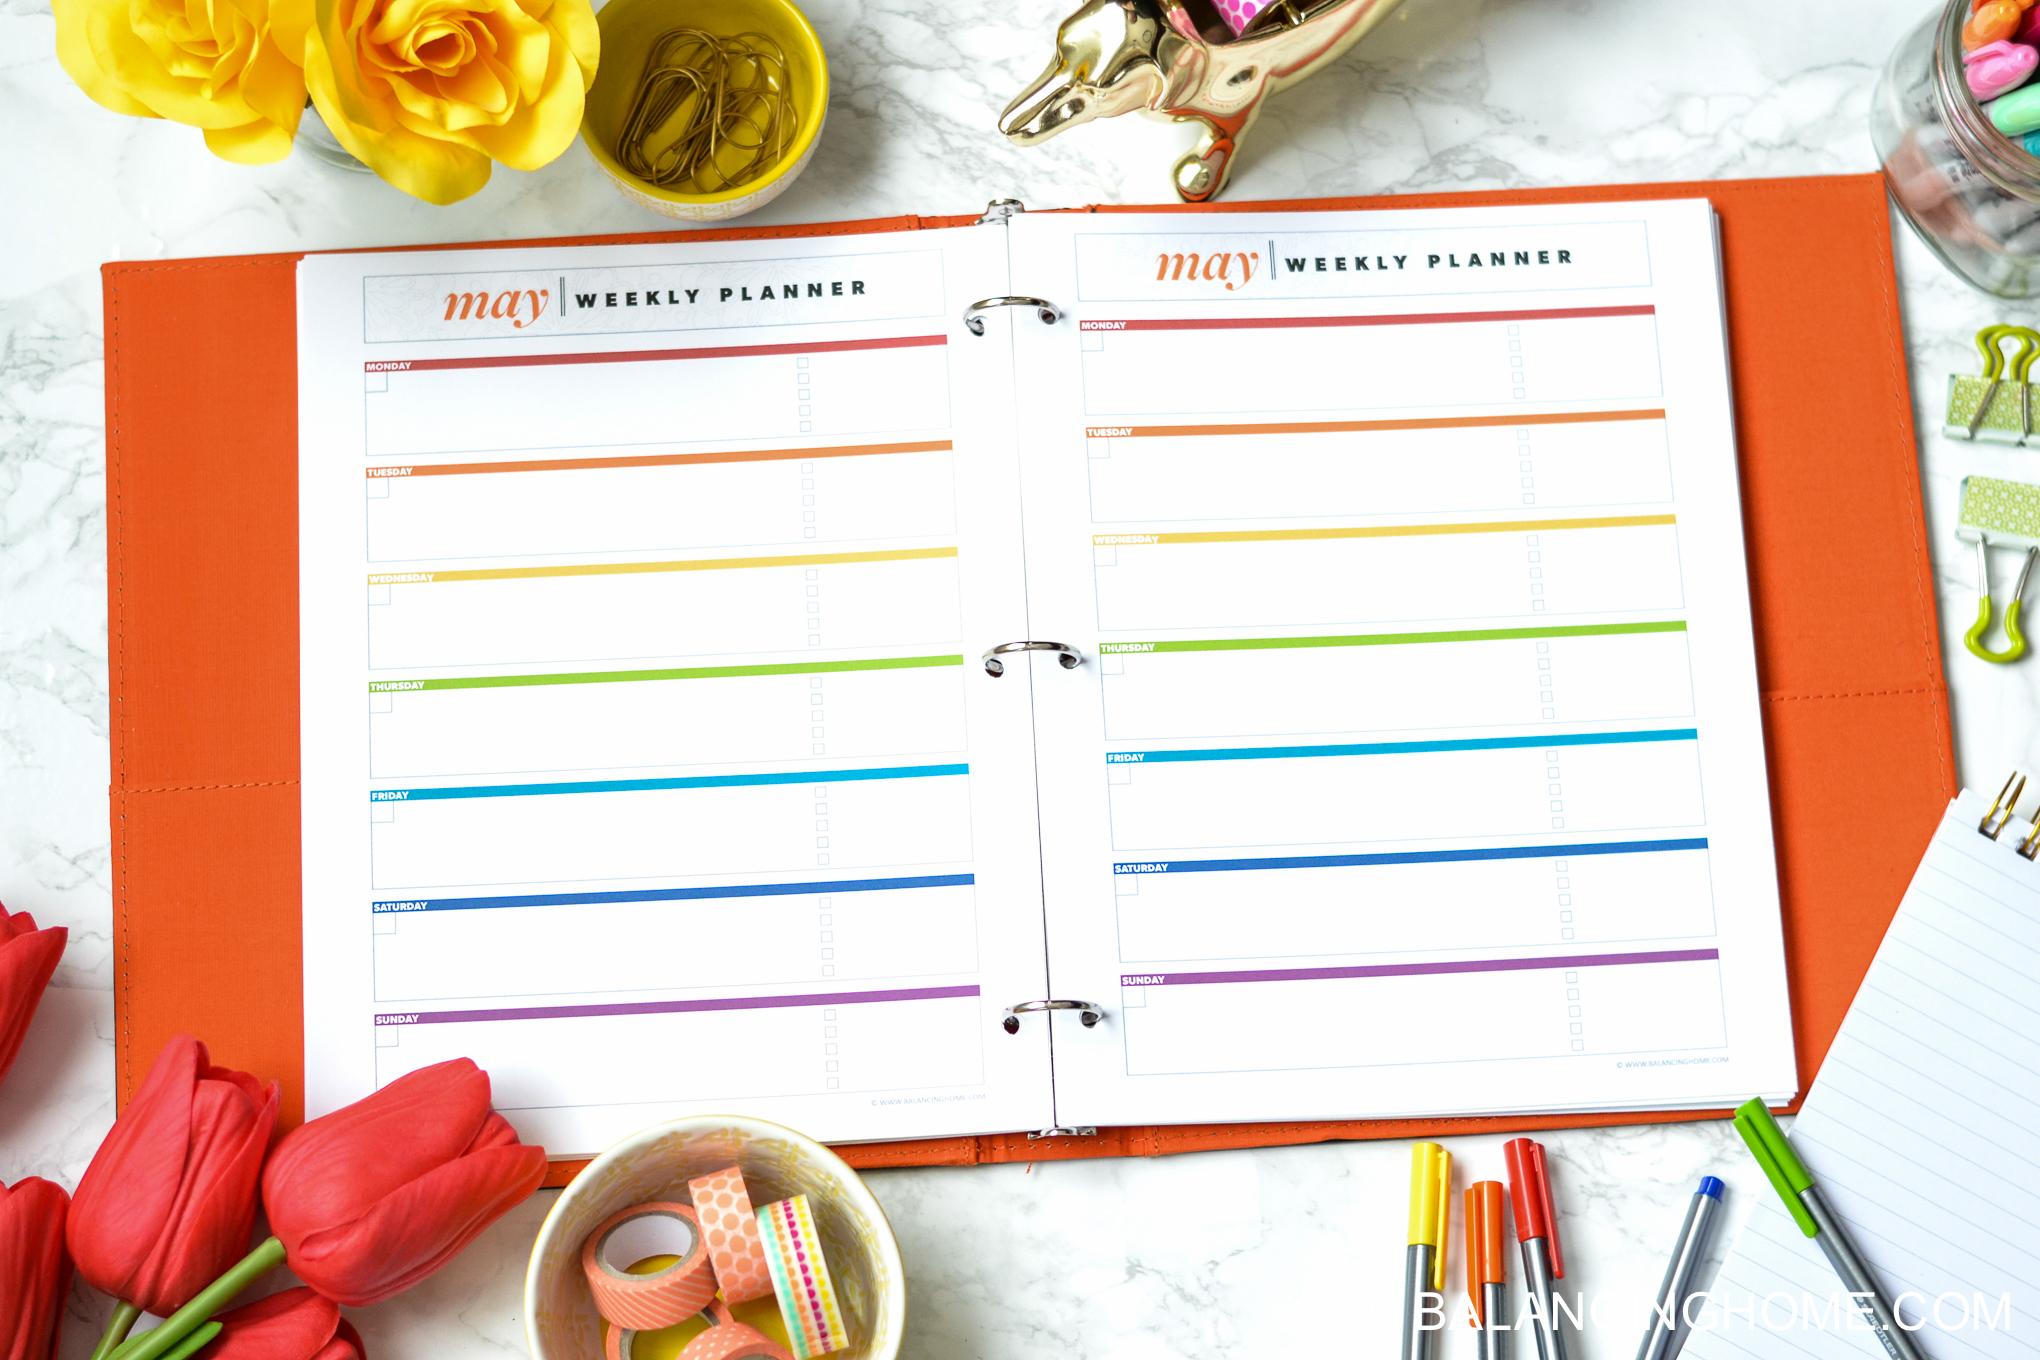 organizing planning printable template - weekly planner